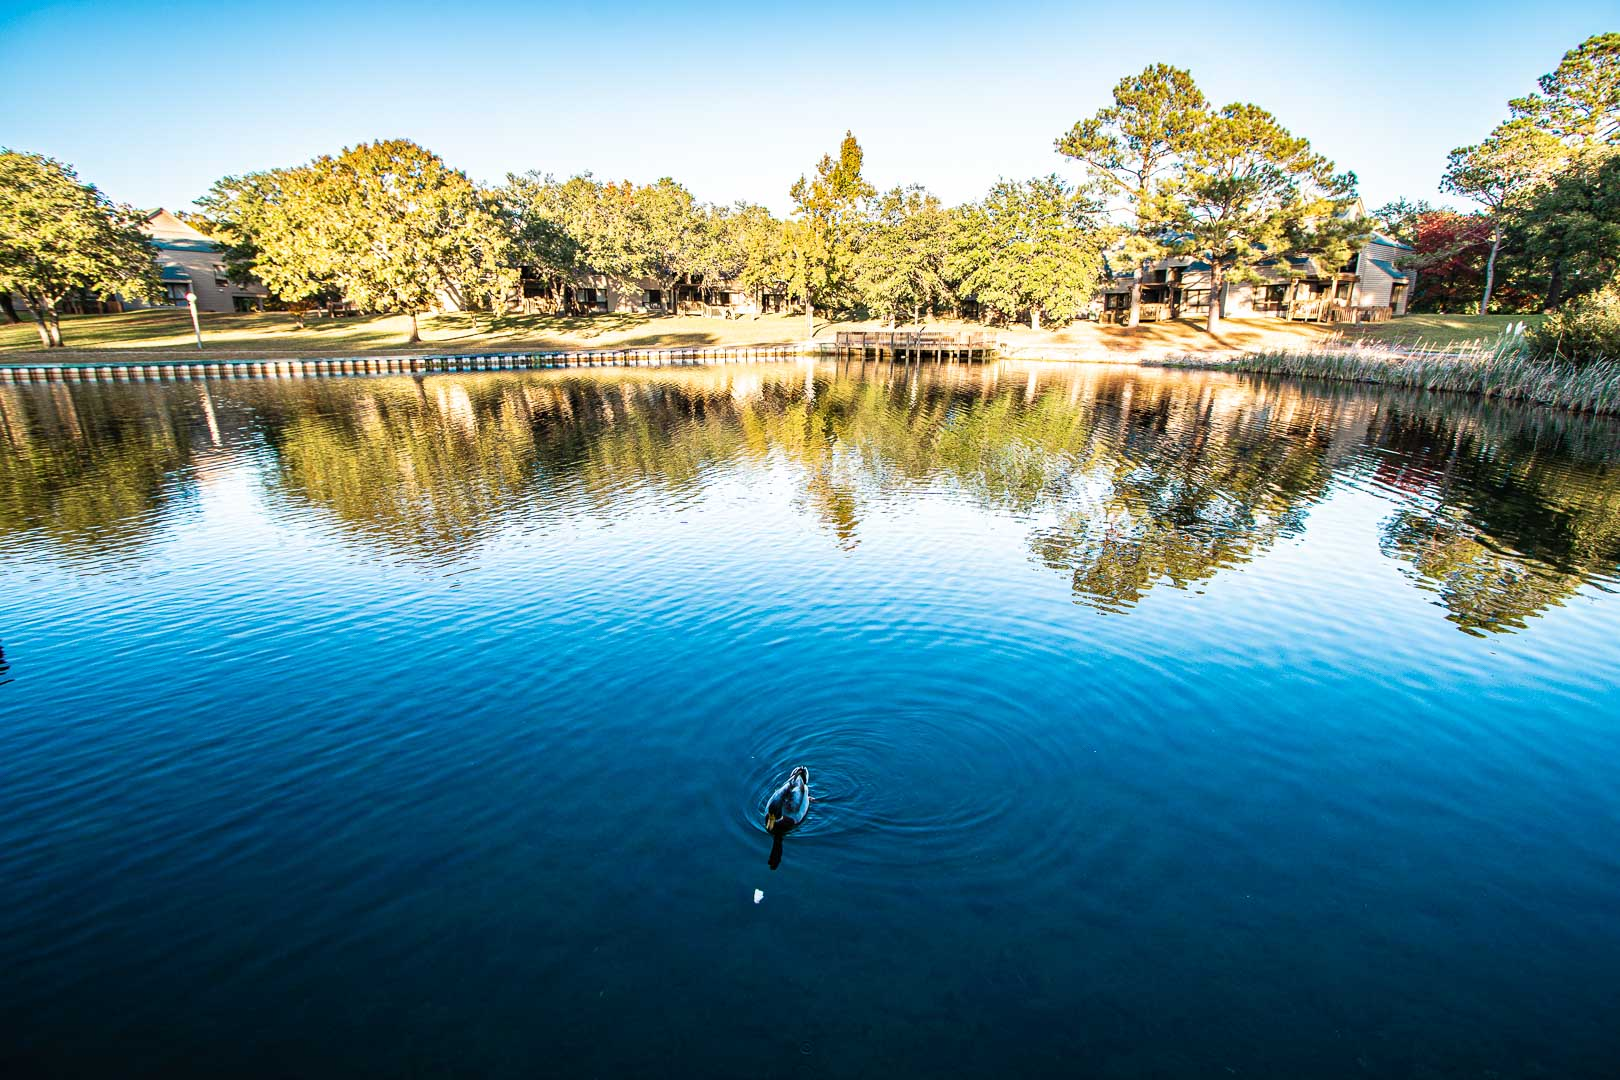 A scenic lake view at VRI's Harbourside II in New Bern, North Carolina.